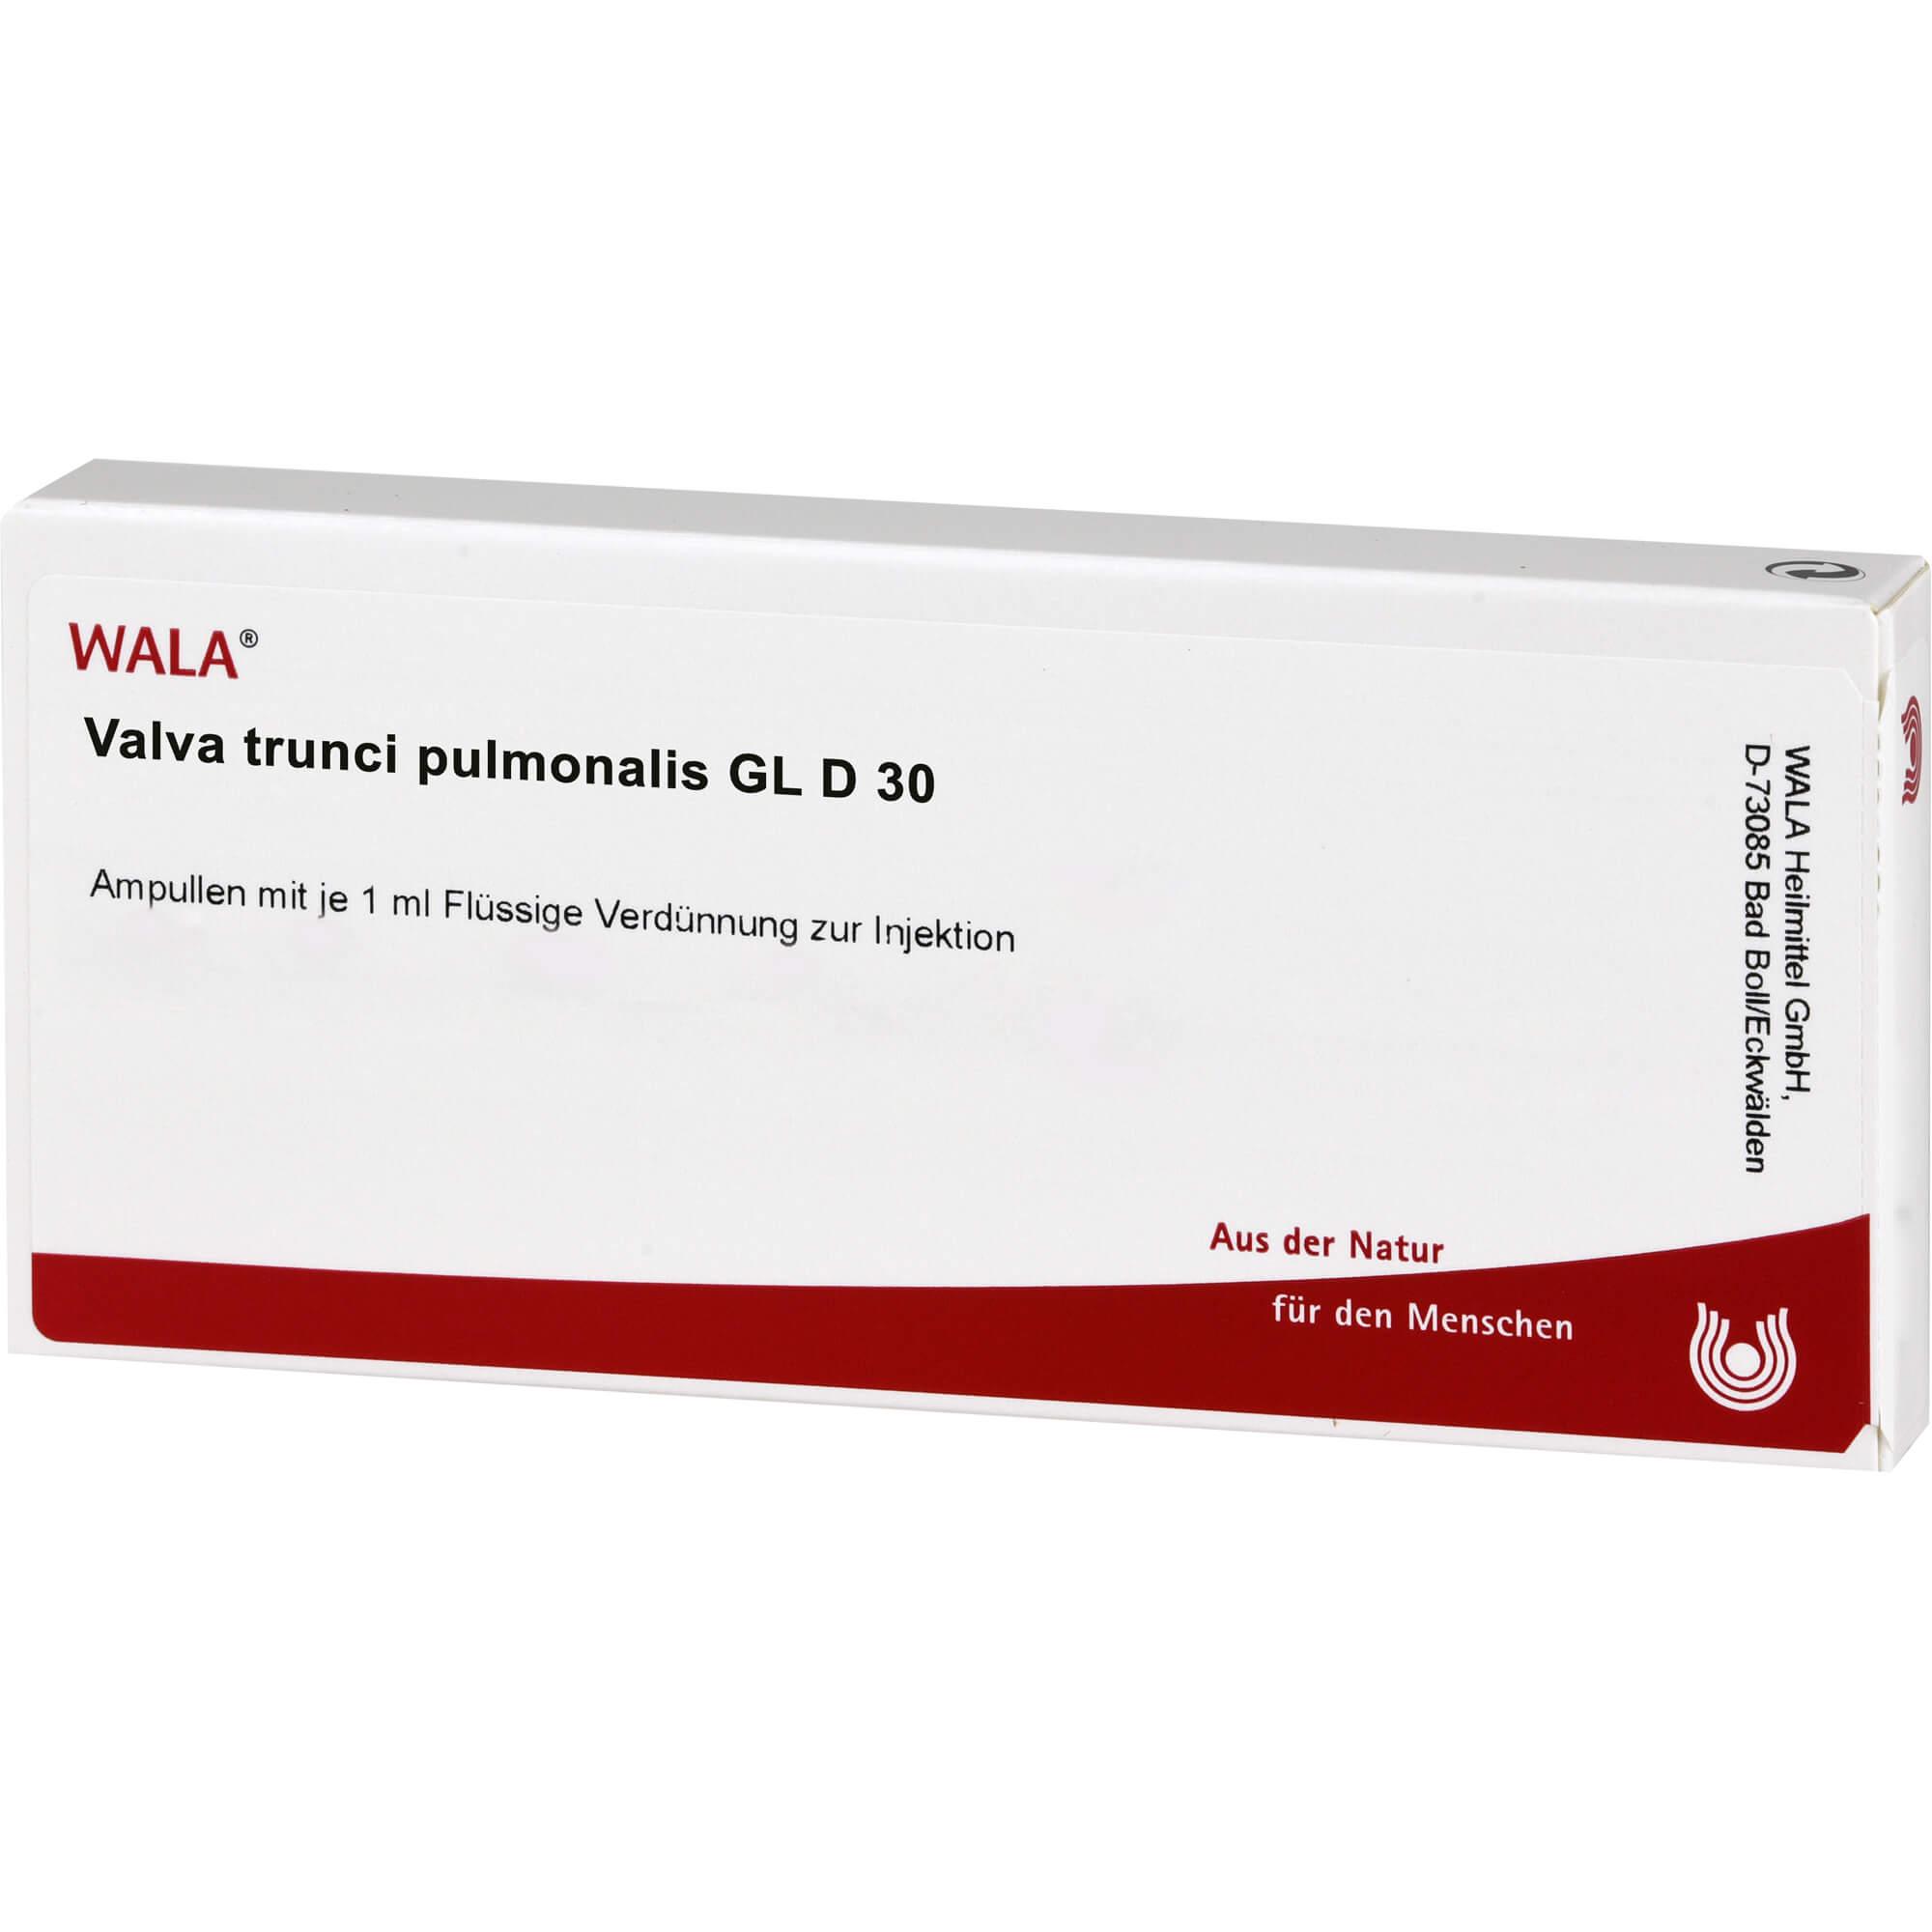 VALVA trunci pulmonalis GL D 30 Ampullen